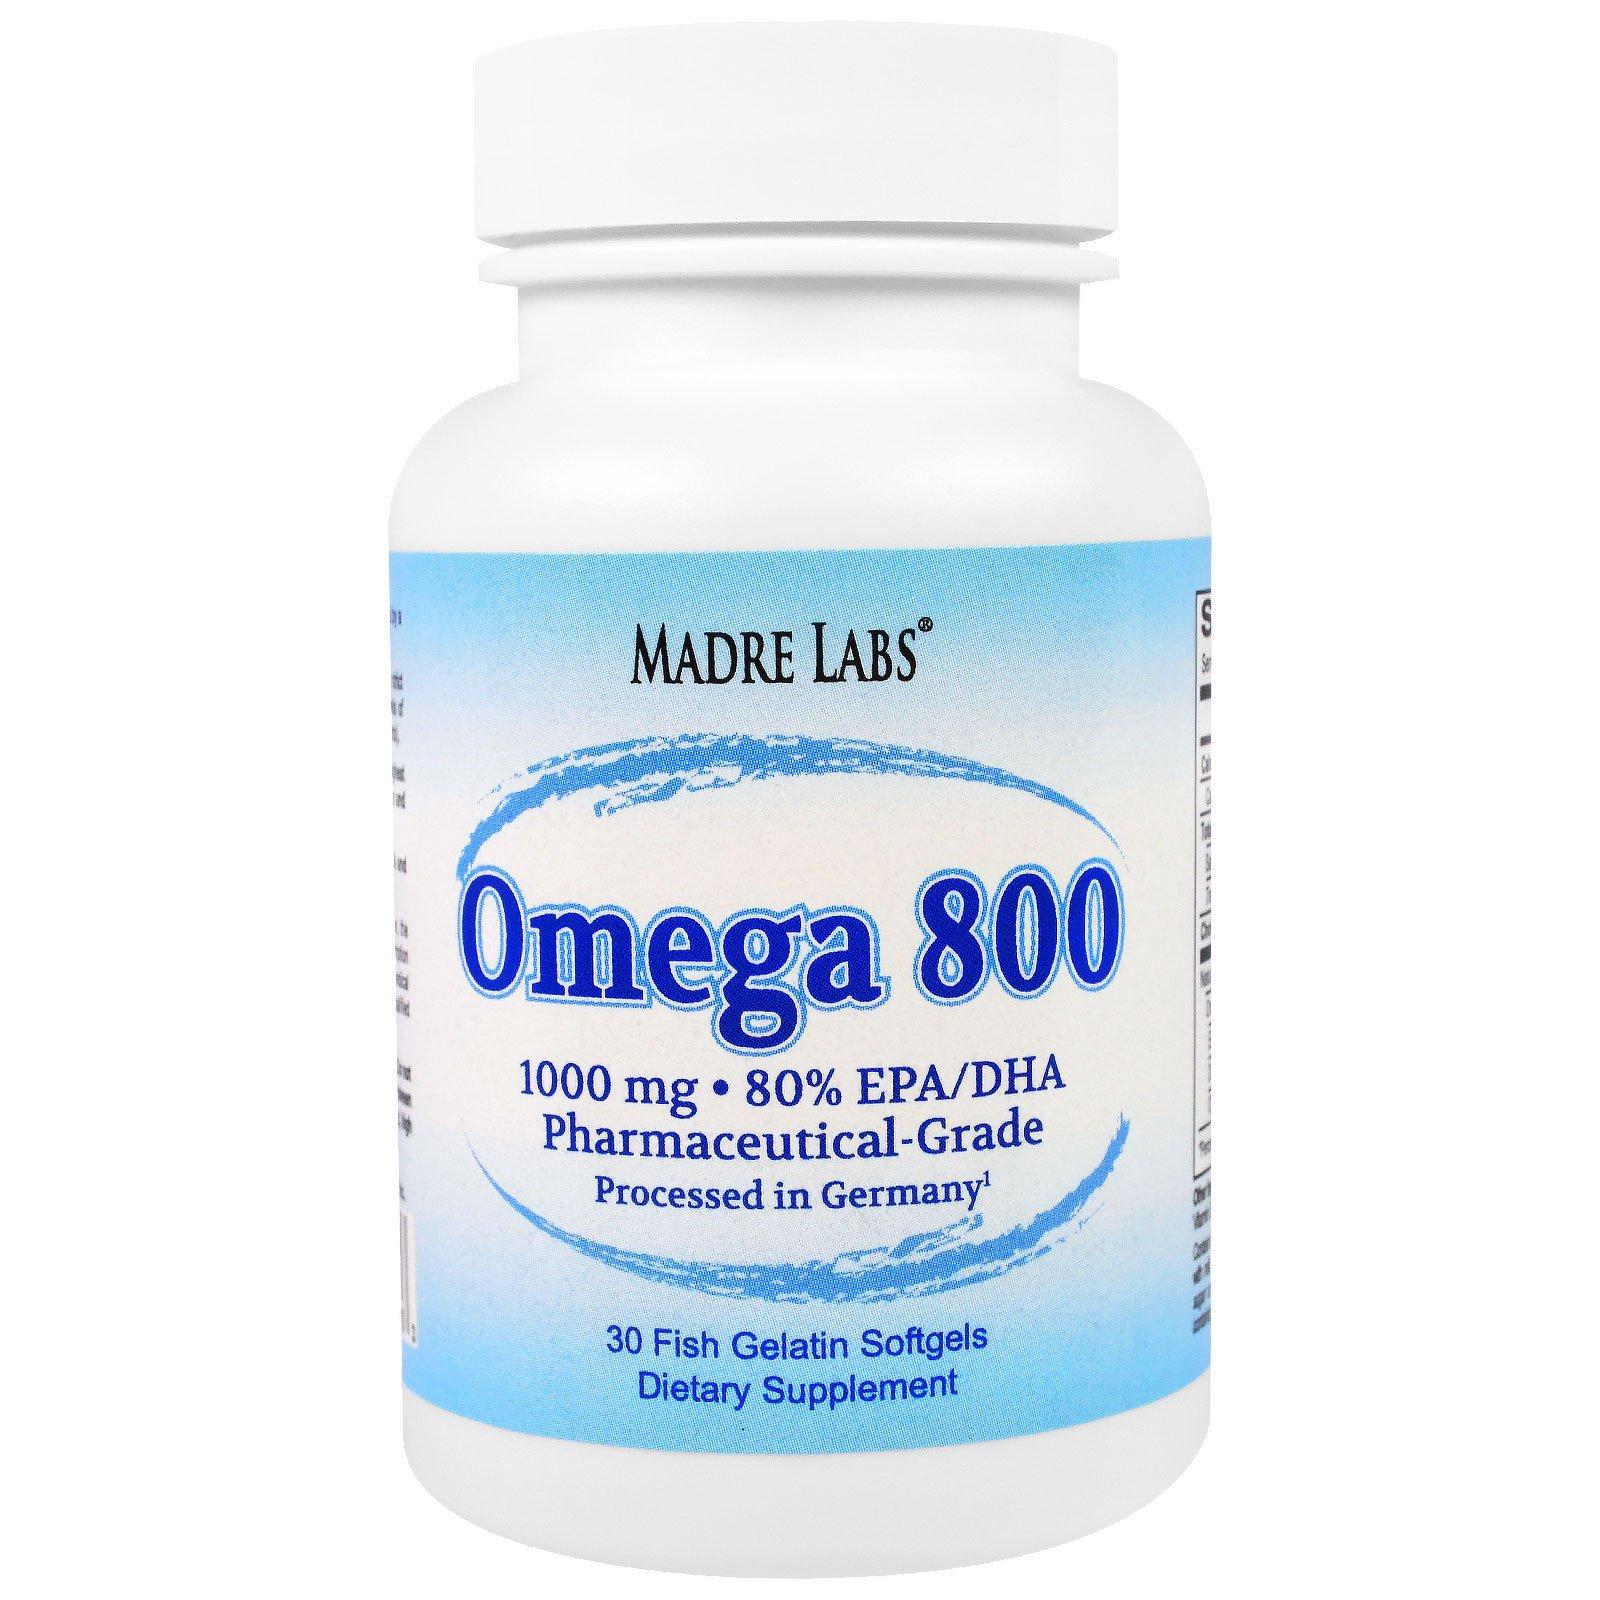 Madre Labs, Омега 800, рыбий жир фармацевтического класса, обработан в Германии, не ГМО, без глютена, 1000 мг, 30 капсул из рыбного желатина